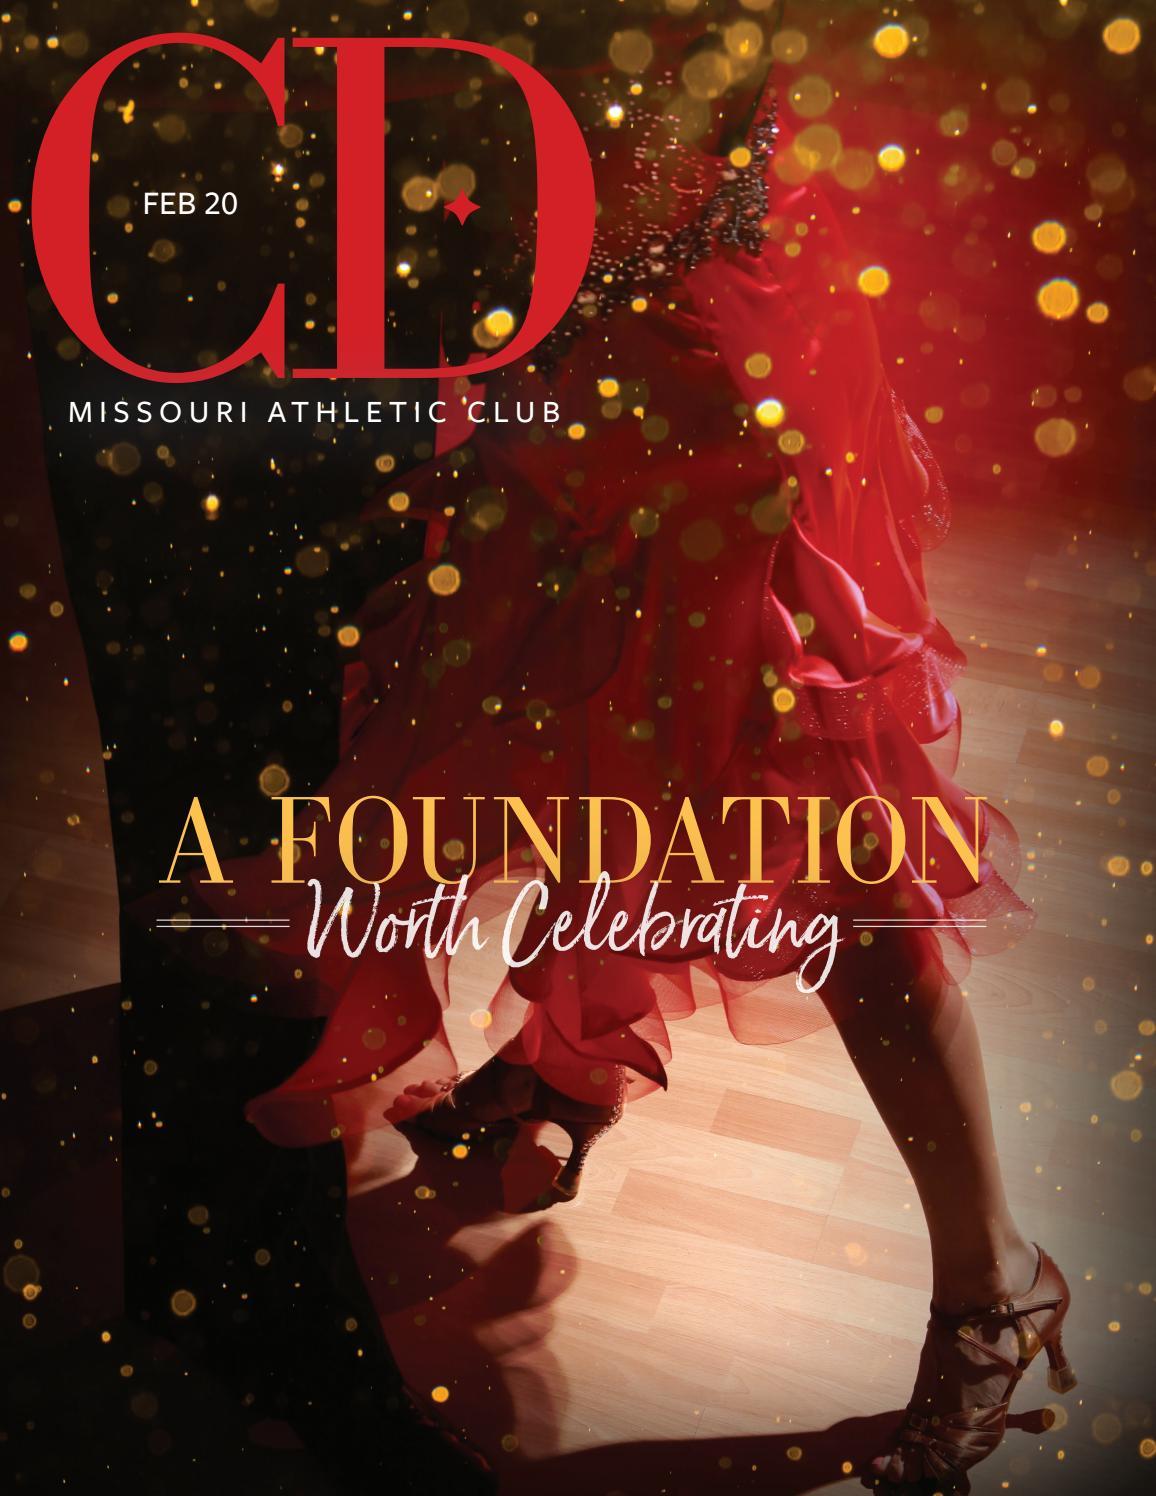 Christmas Dat Brunch St Louis 2020 Missouri Athletic Club, Cherry Diamond, February 2020 by Missouri